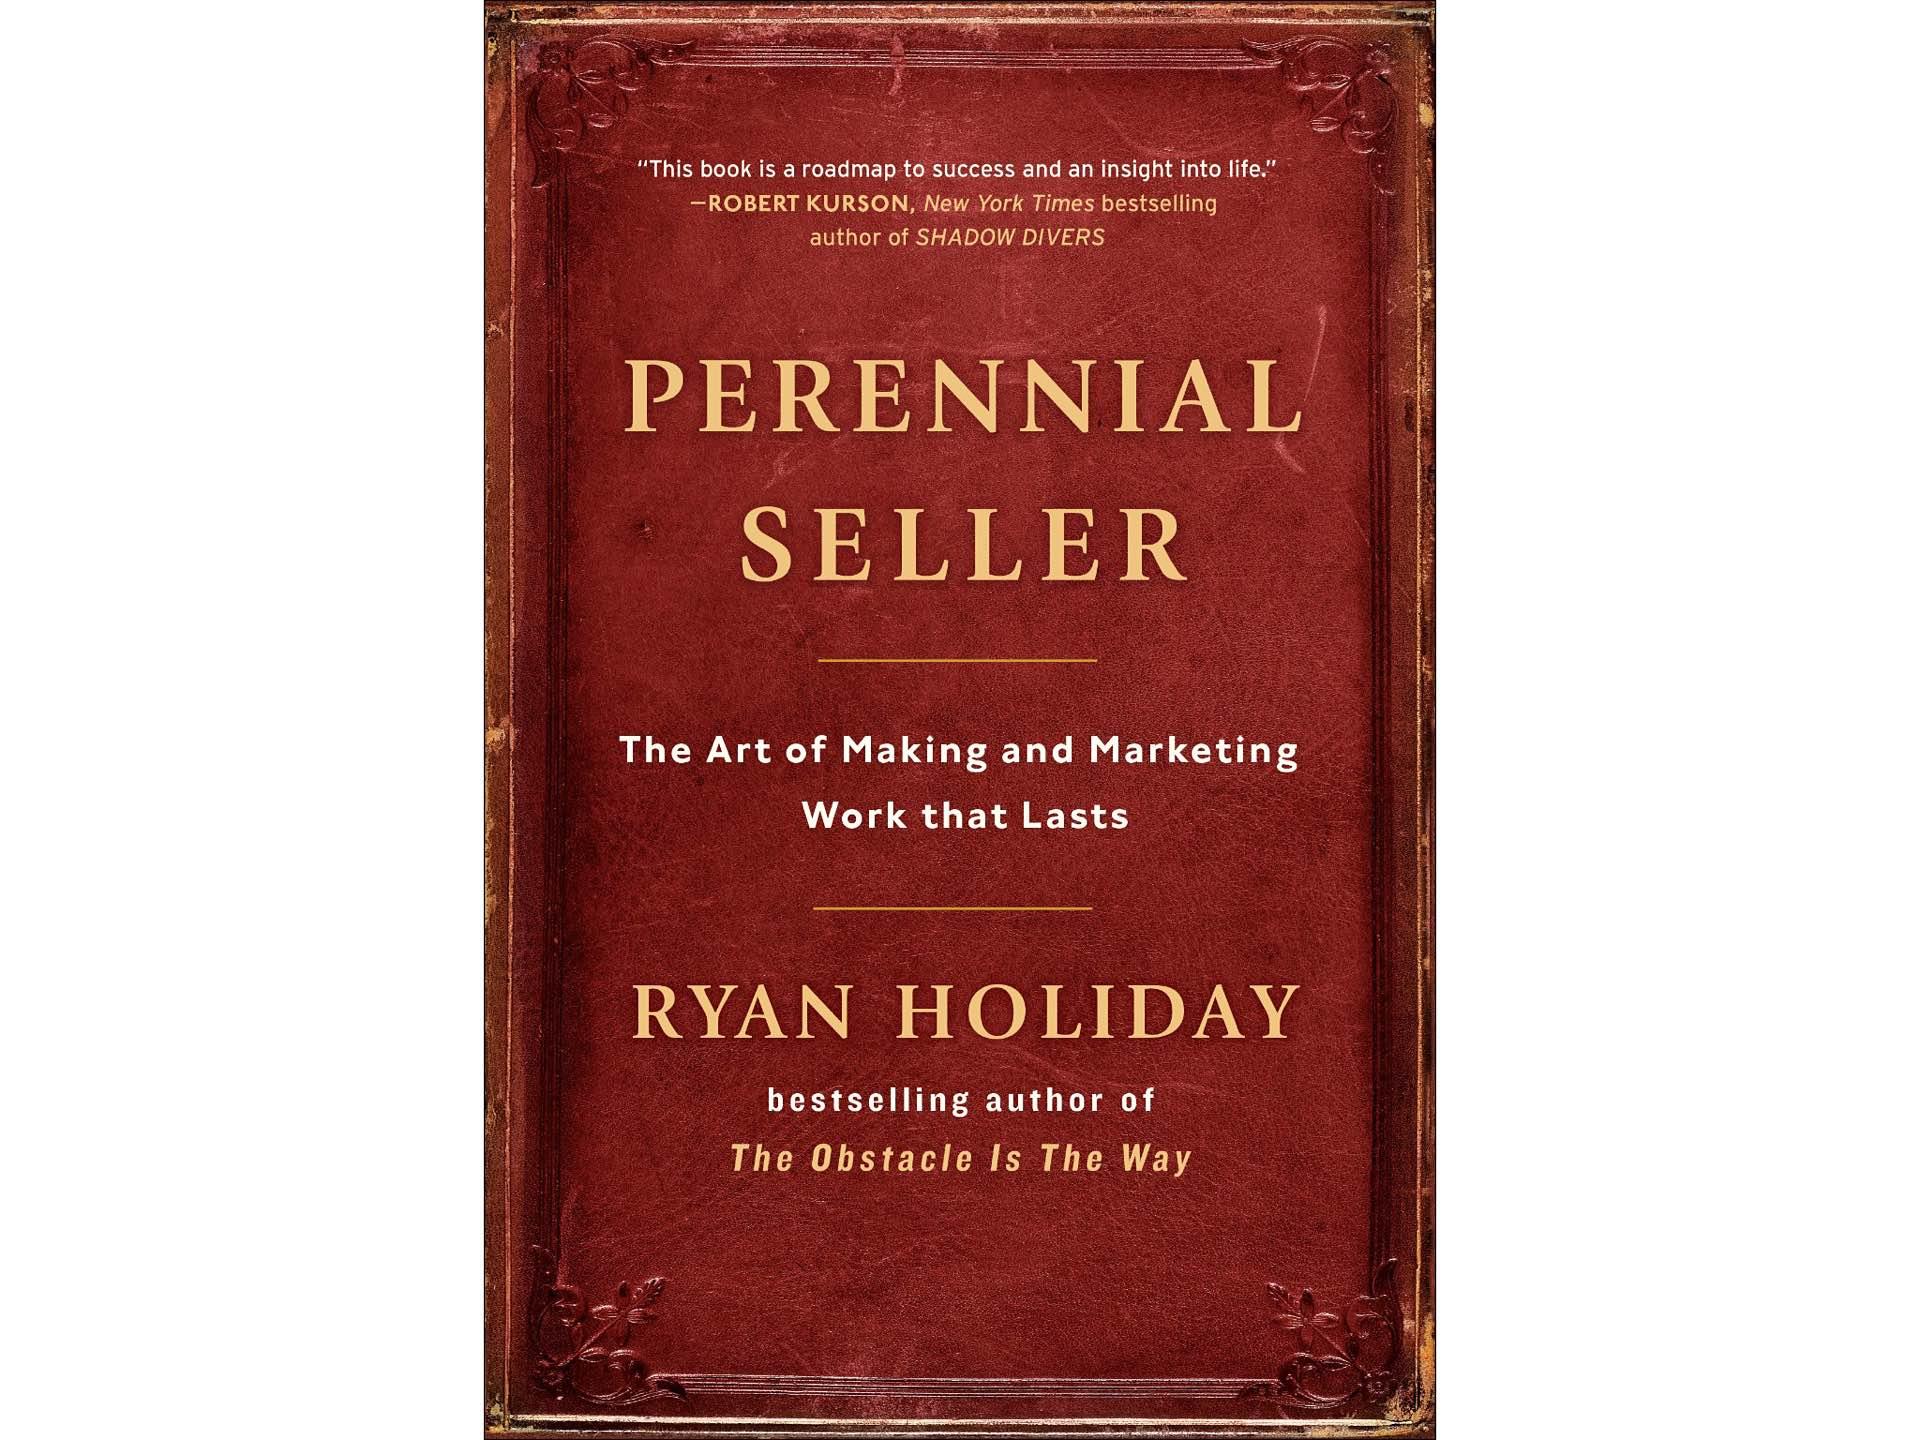 Perennial Seller by Ryan Holiday.